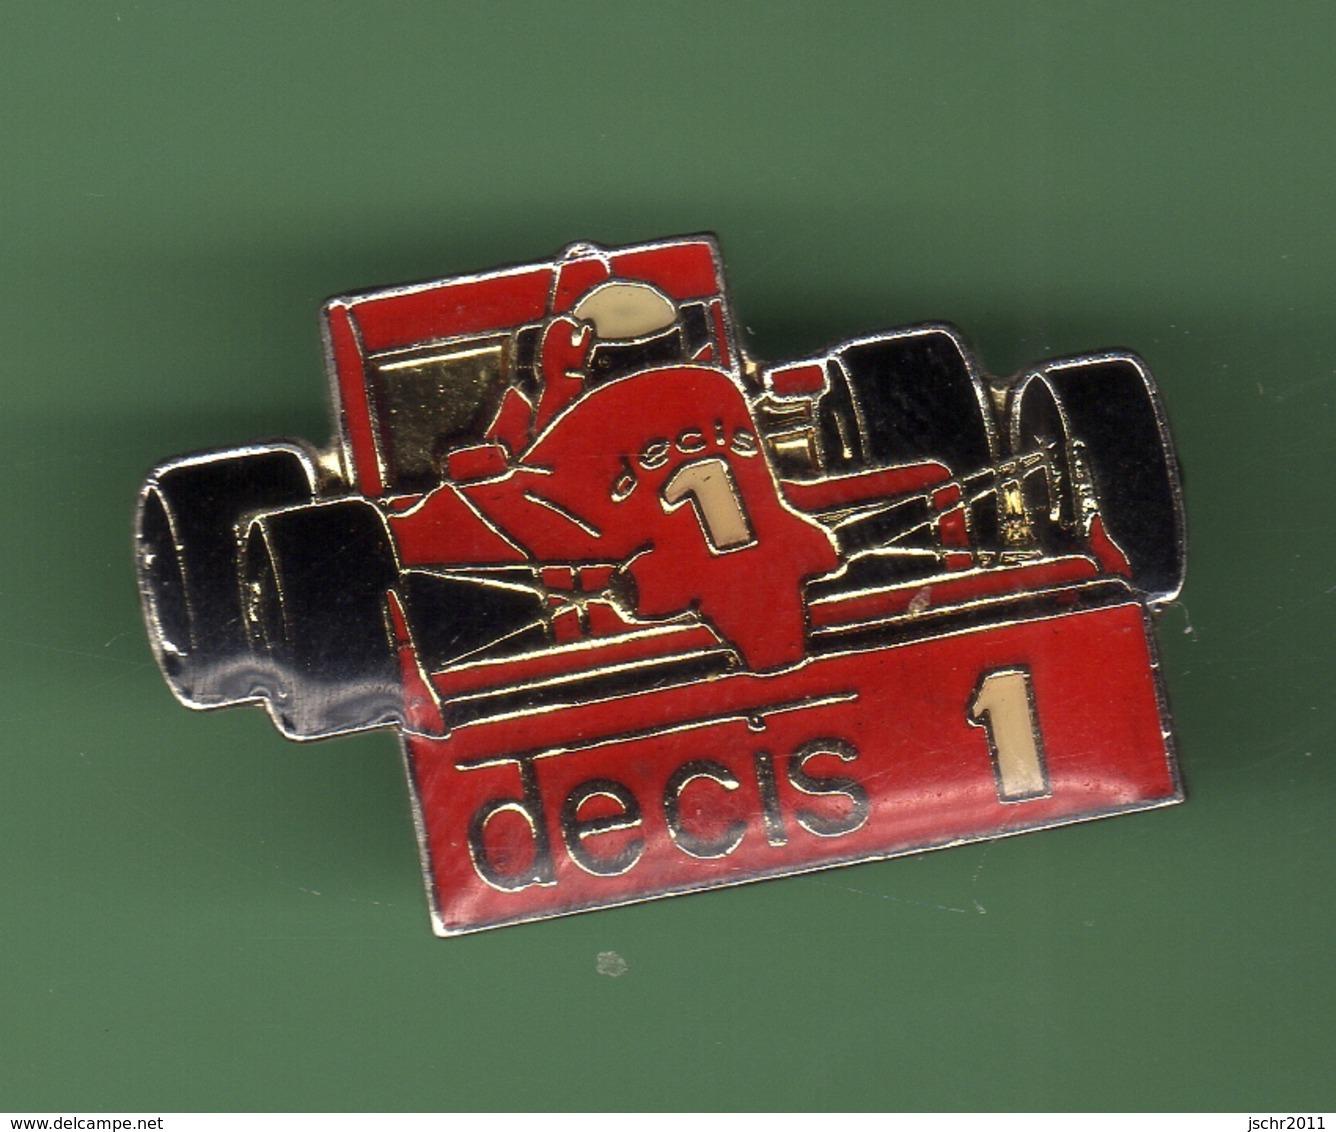 F1 *** DECIS 1 *** 1043 (80) - Automobile - F1